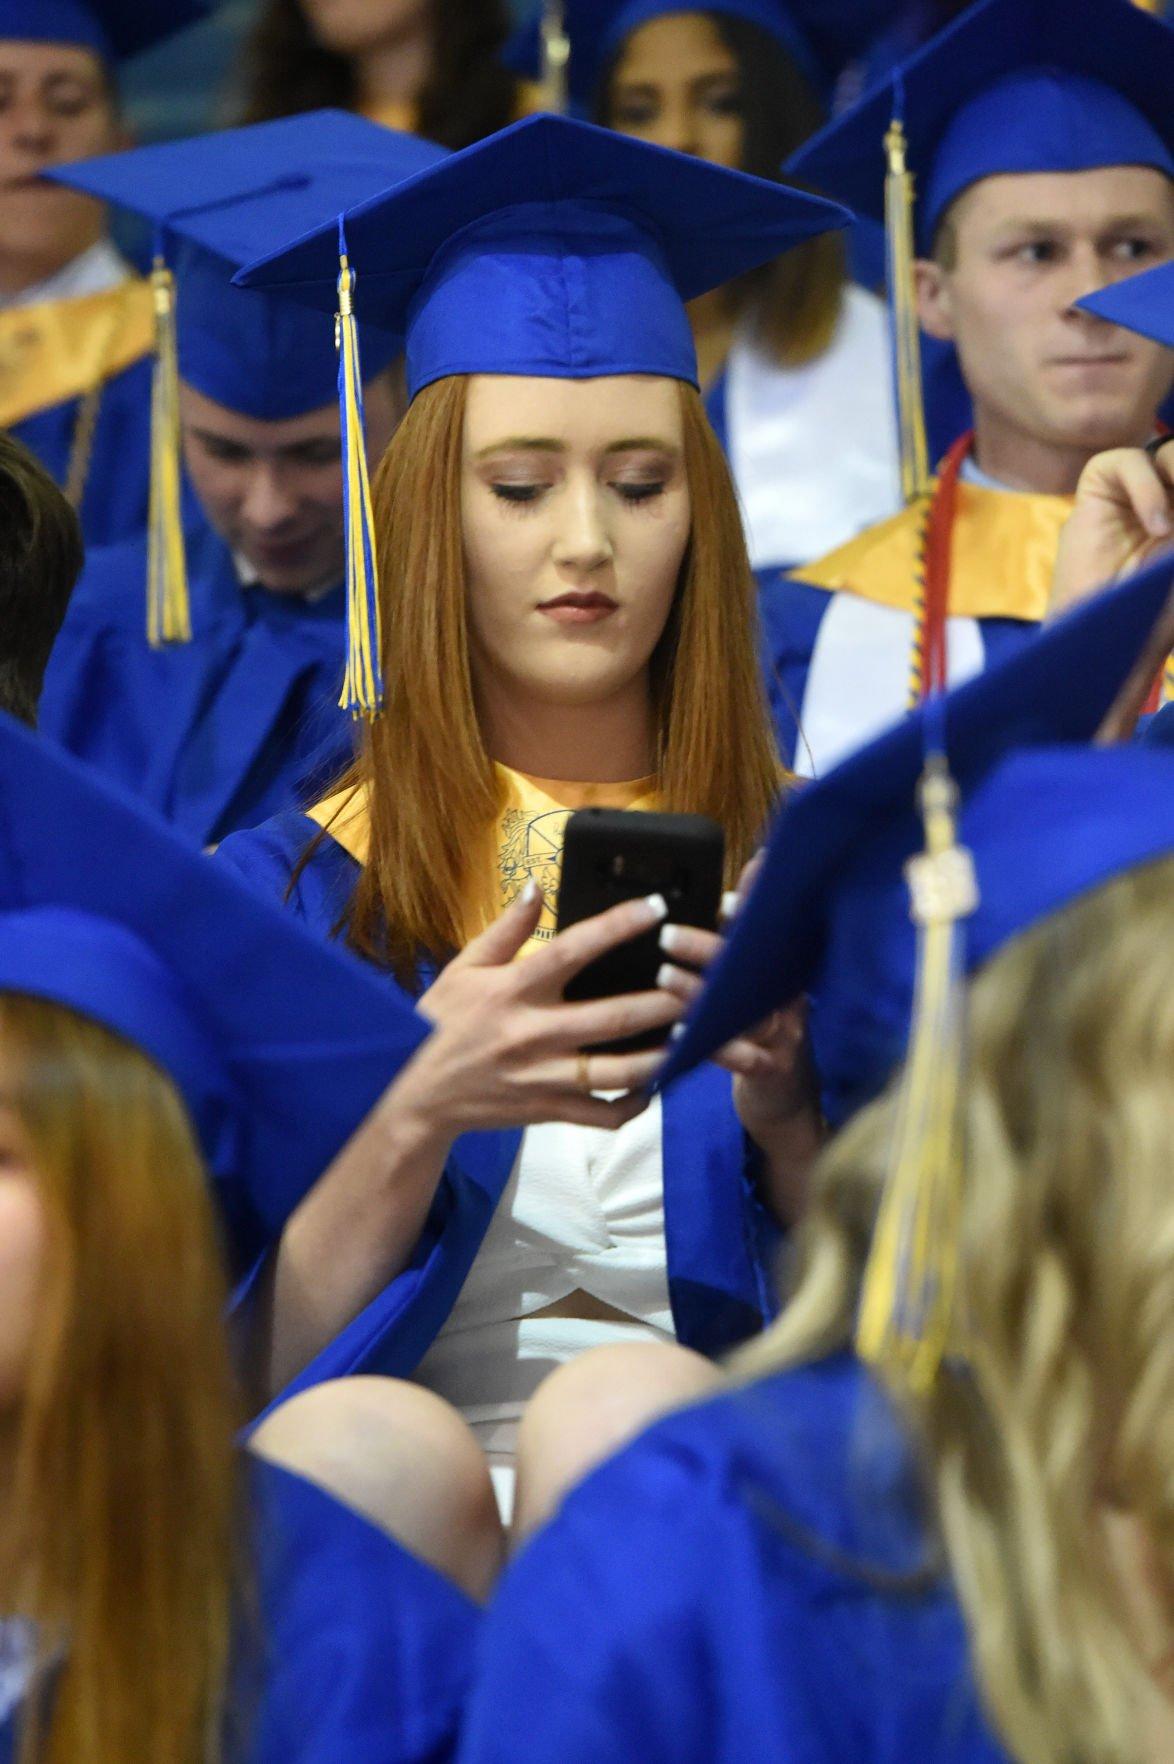 PHOTOS: Rampart High School Graduation